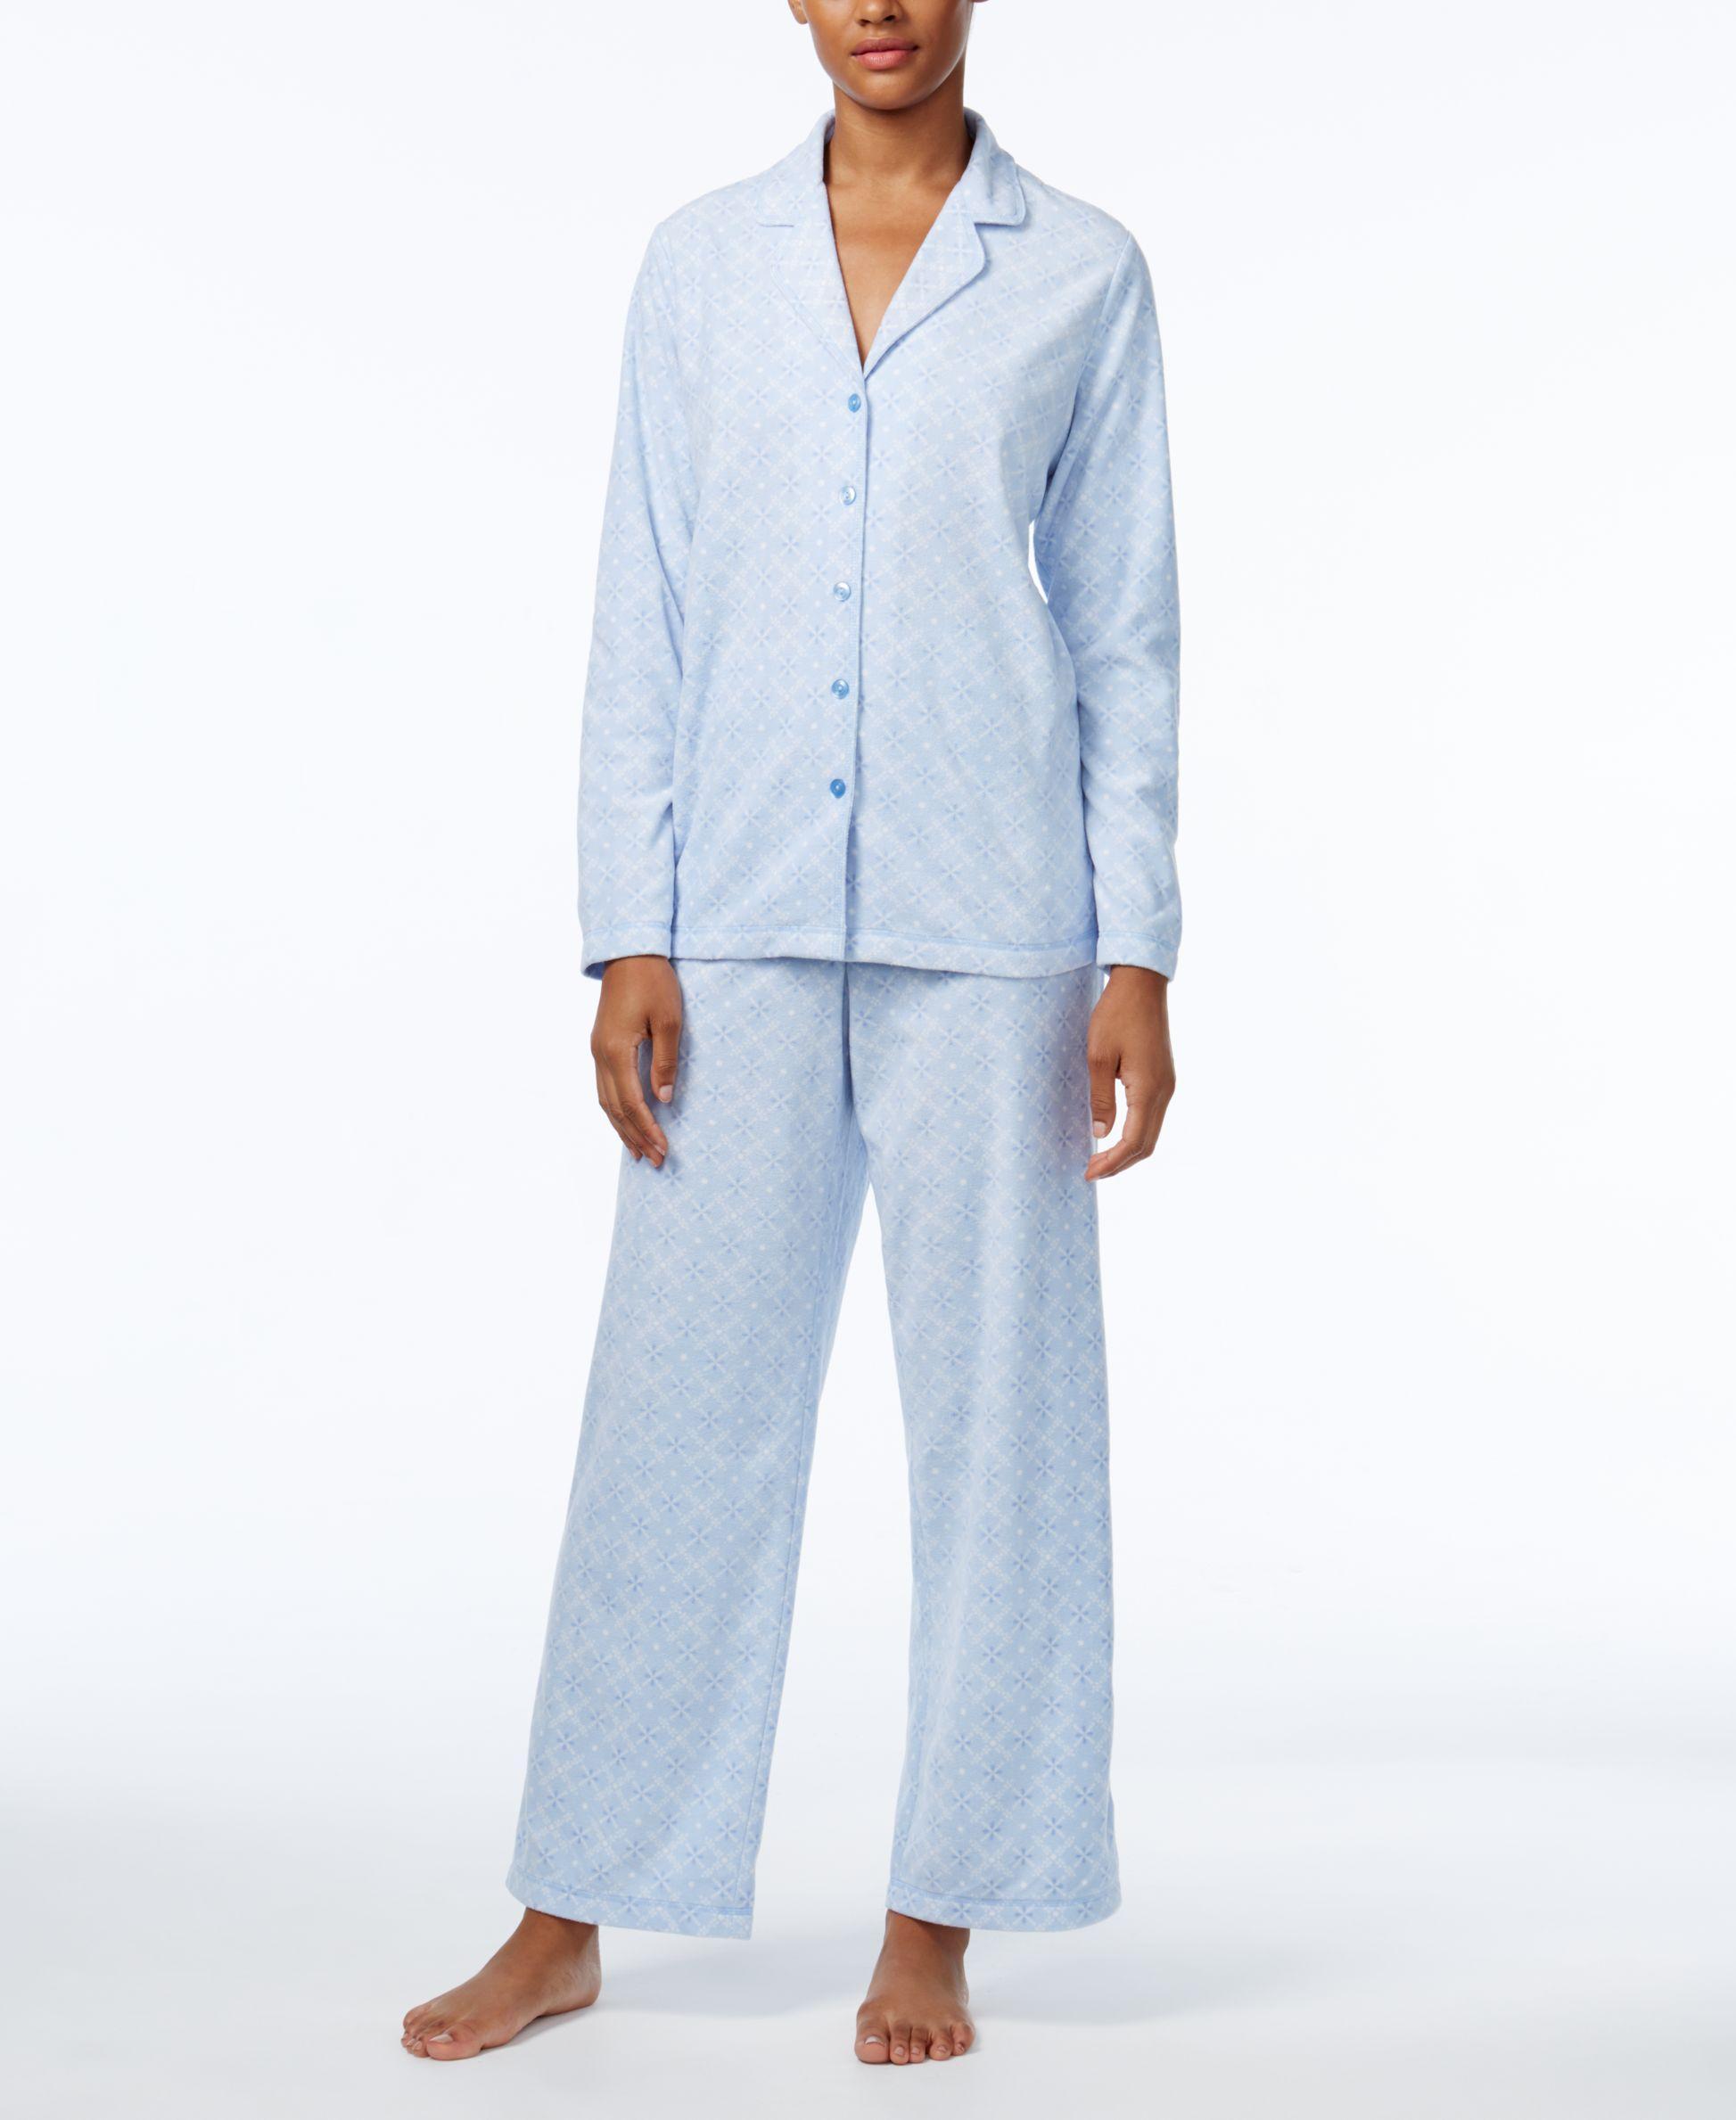 e06cc5c329 Lyst - Charter club Petite Fleece Pajama Set in Blue